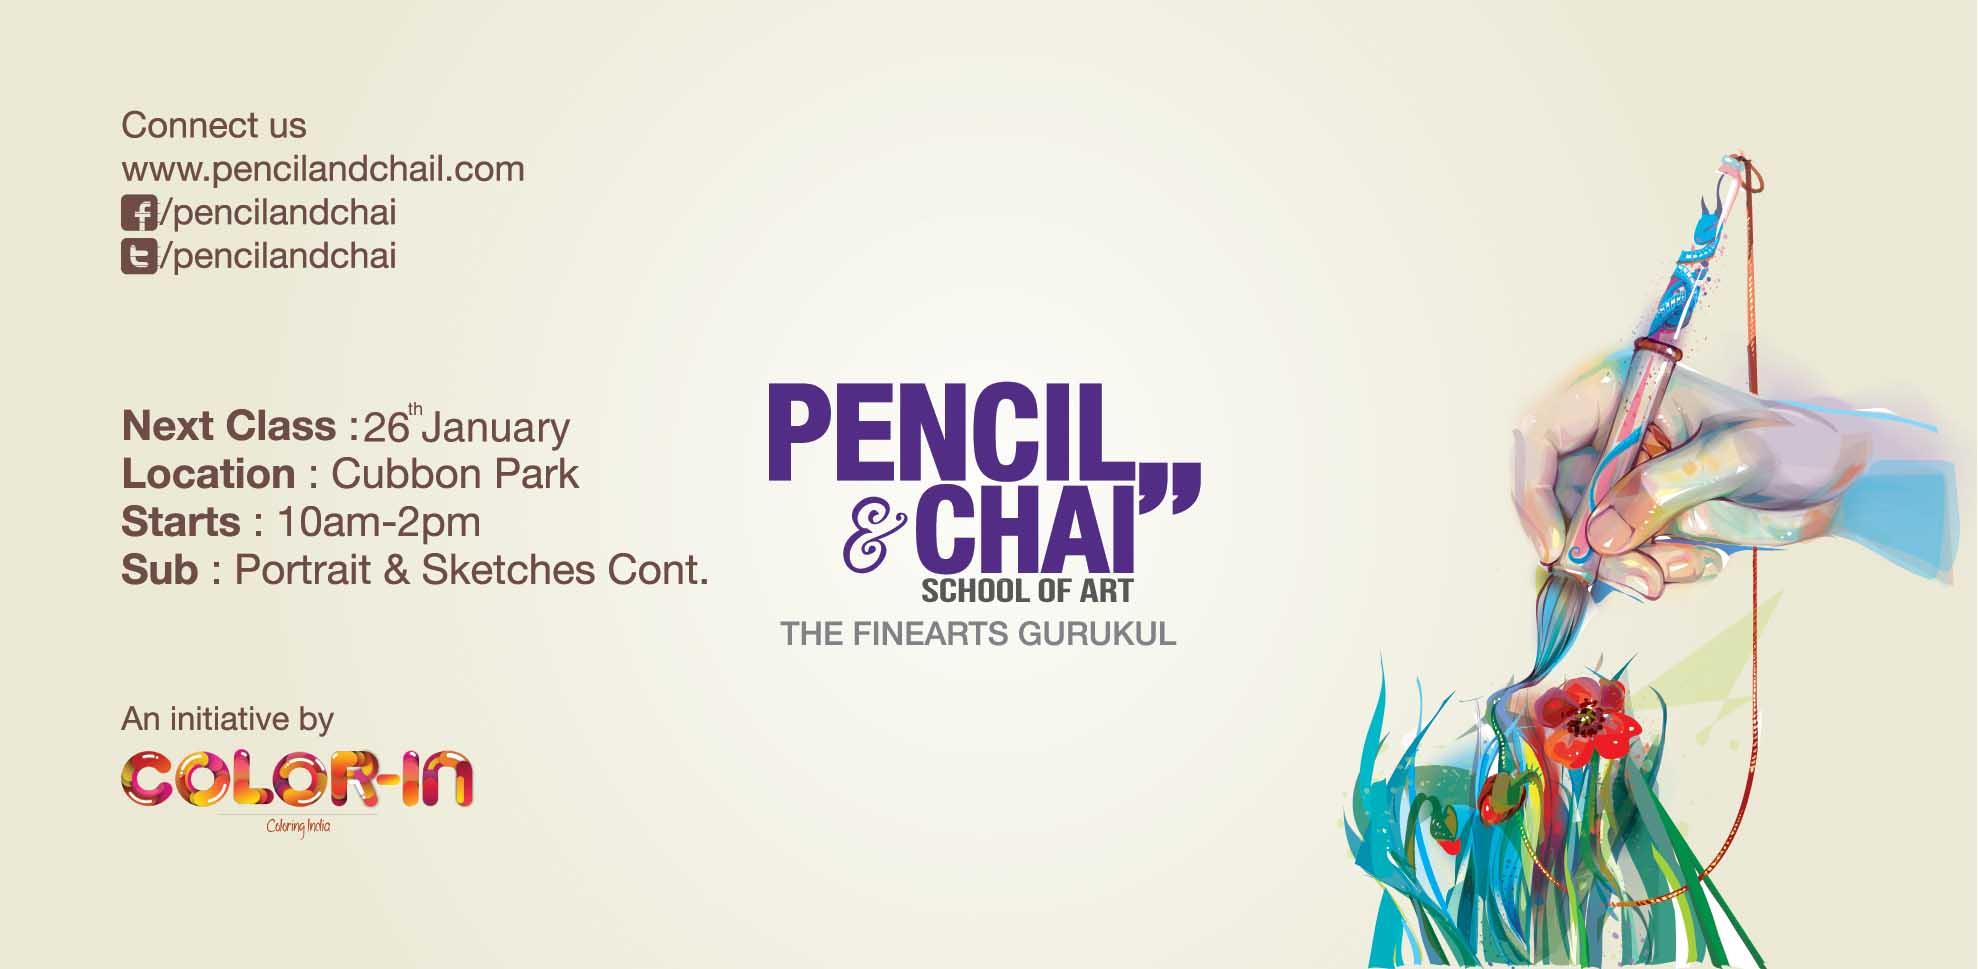 Live portrait drawing class -PAC SOA Live portrait drawing class -PAC SOA 35th session